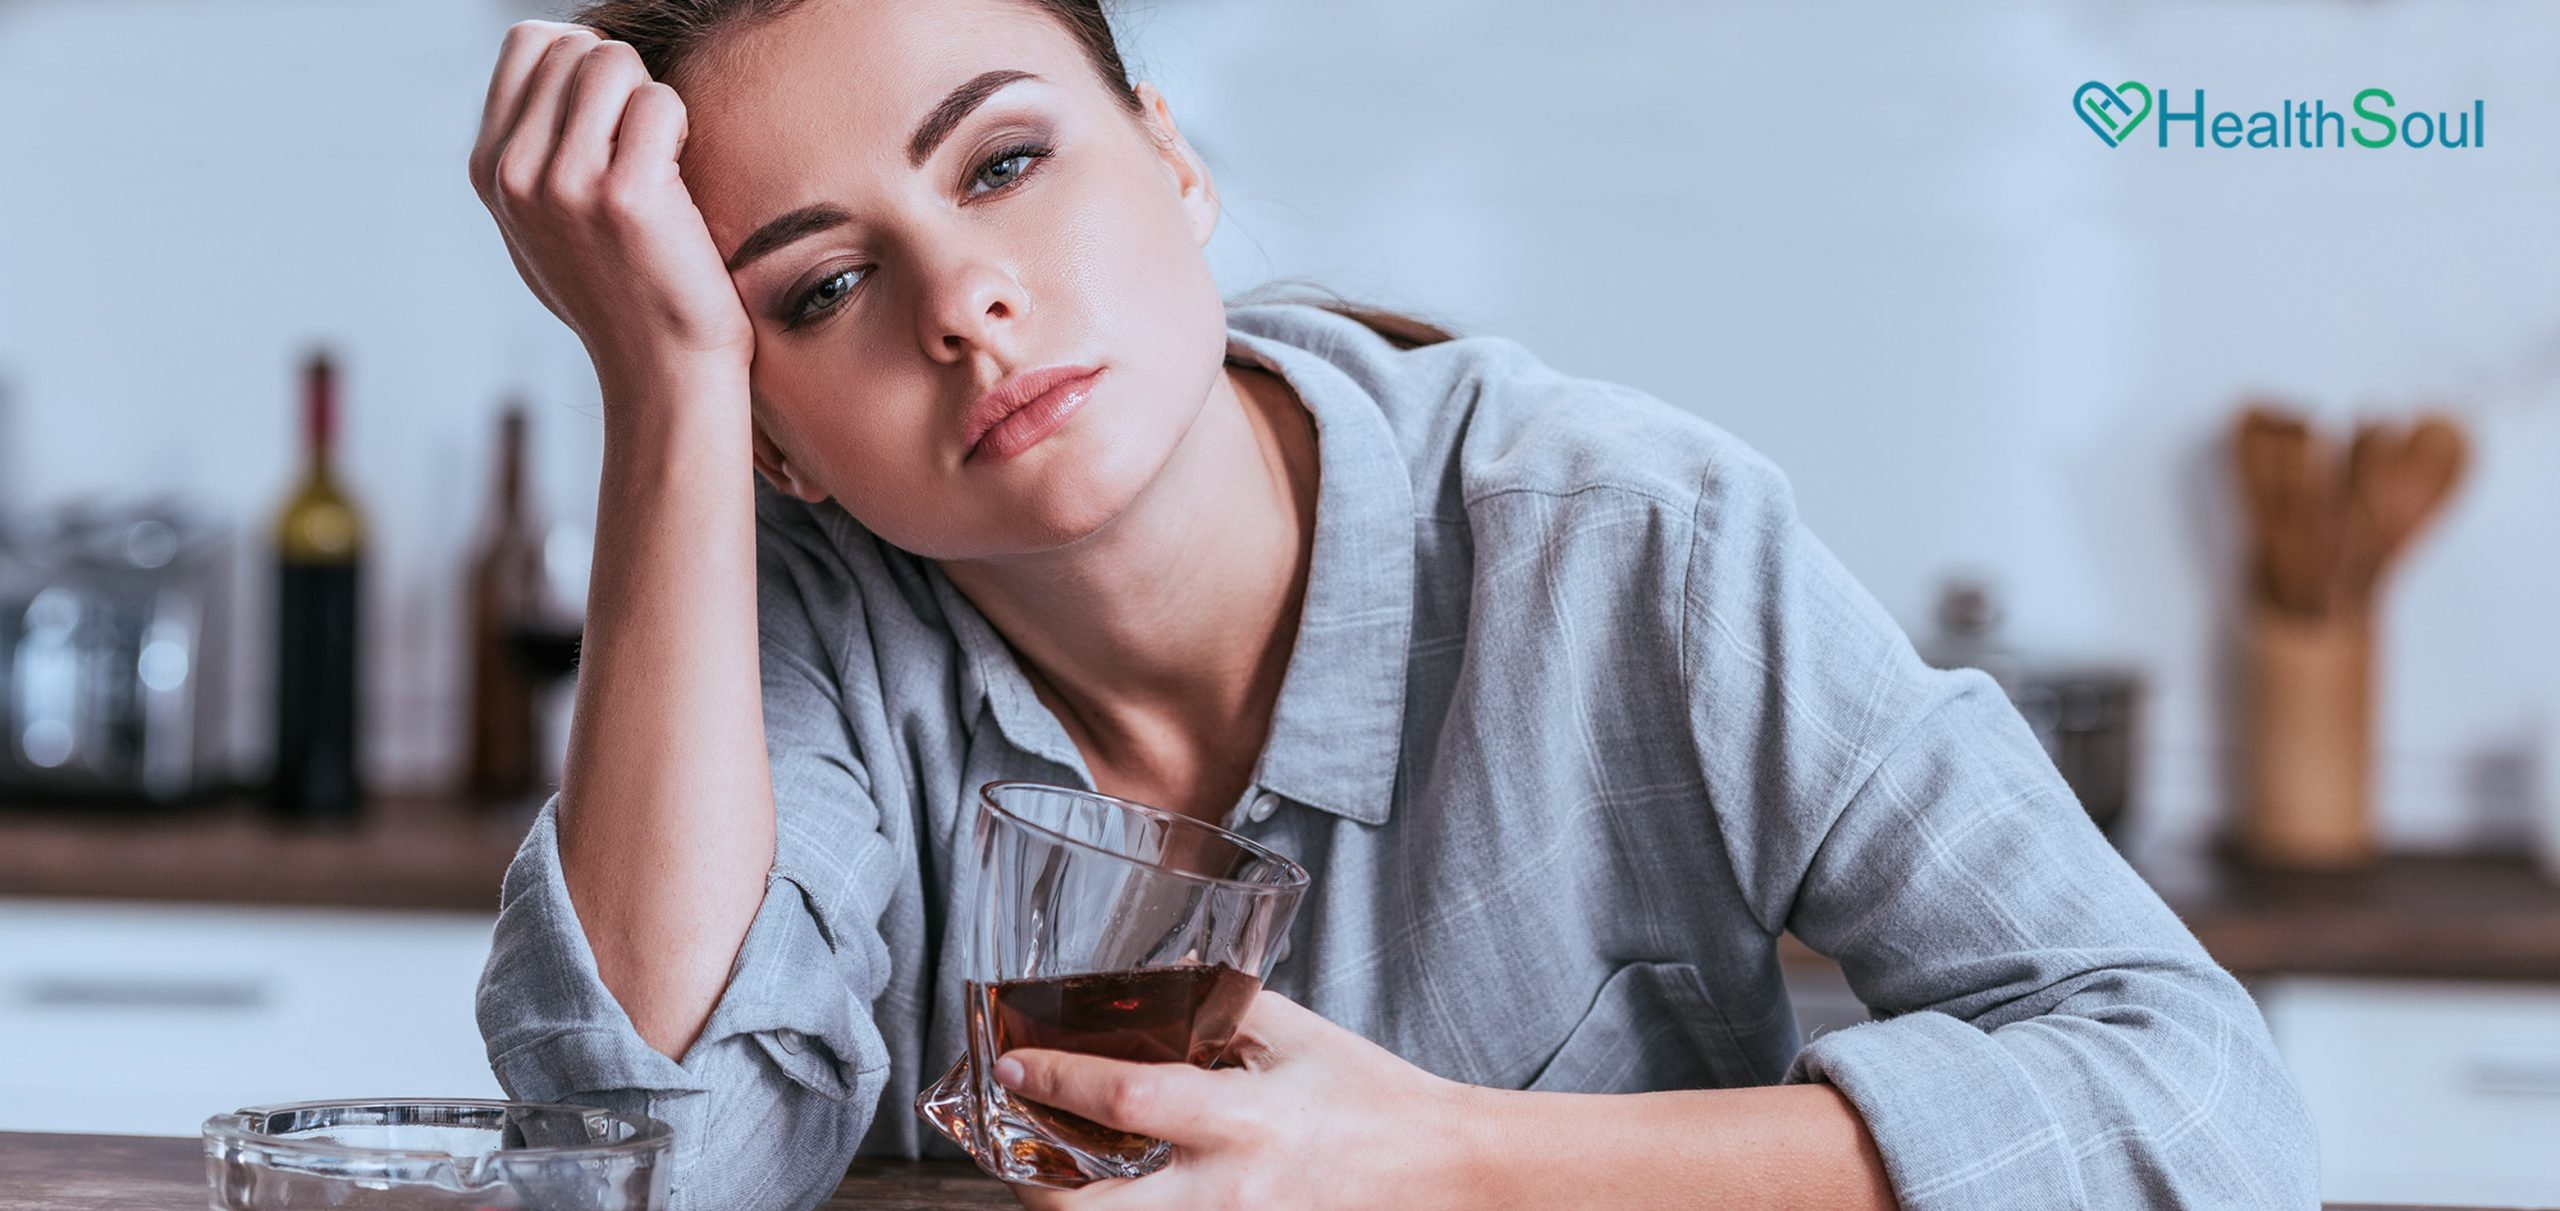 7 Amazing Health Benefits Of Avoiding Alcohol | HealthSoul